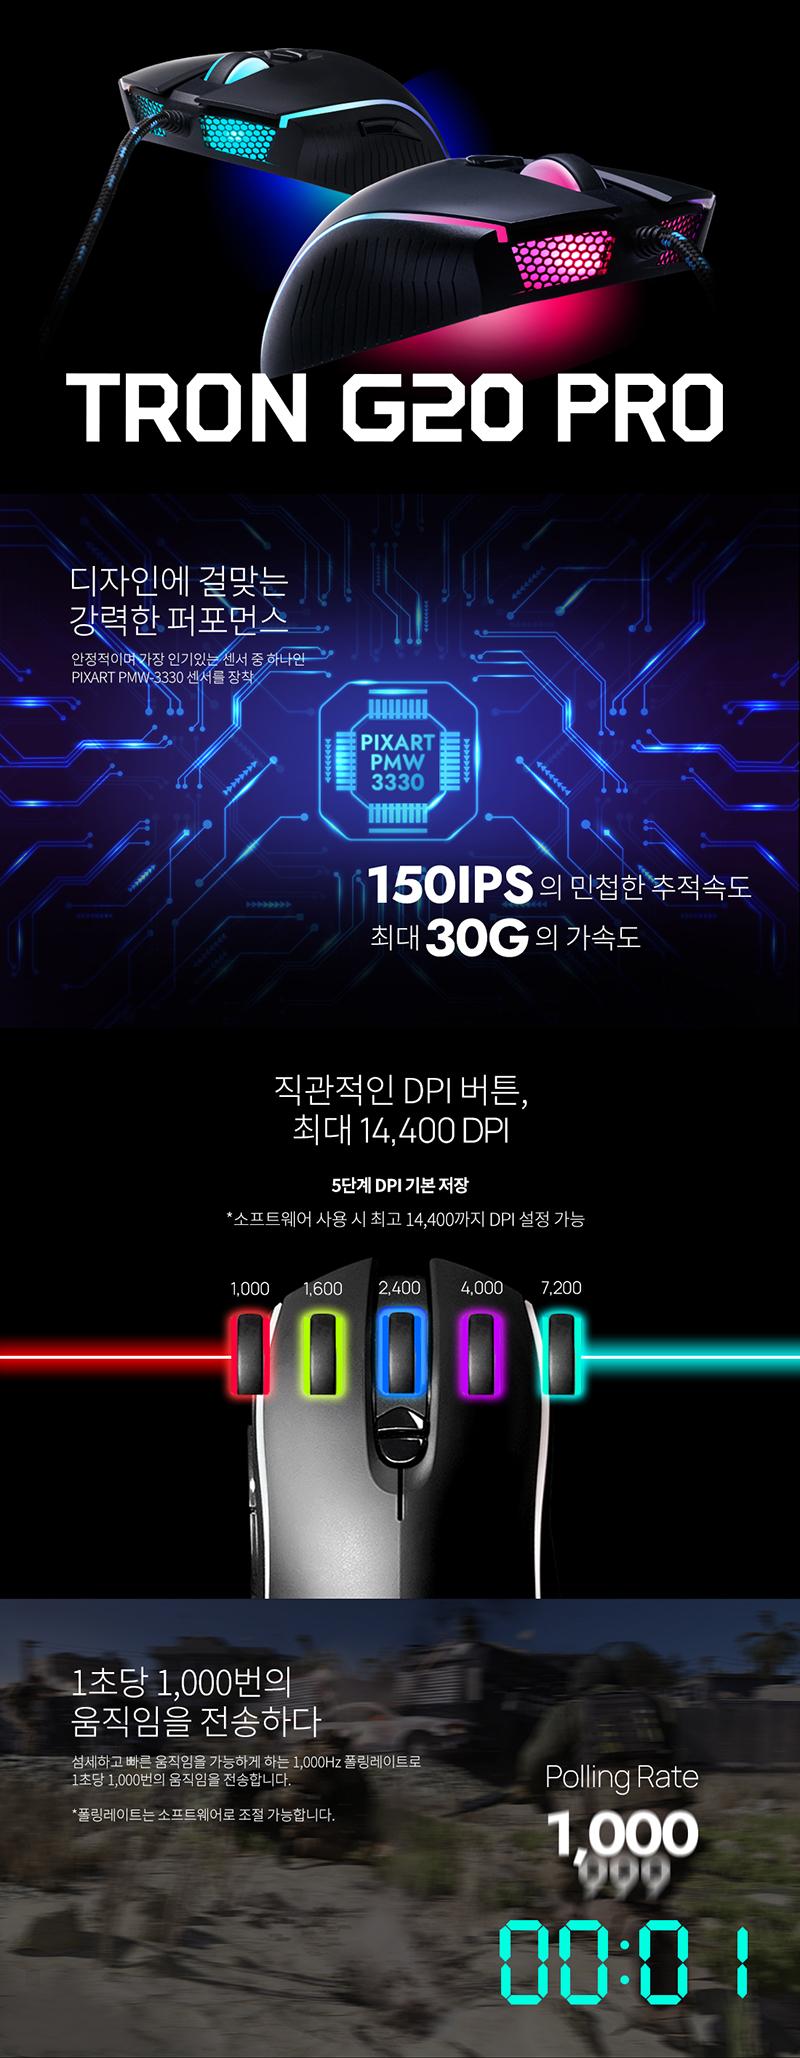 MAXTILL TRON G20 PRO PMW 3330 RGB 게이밍마우스 (화이트)